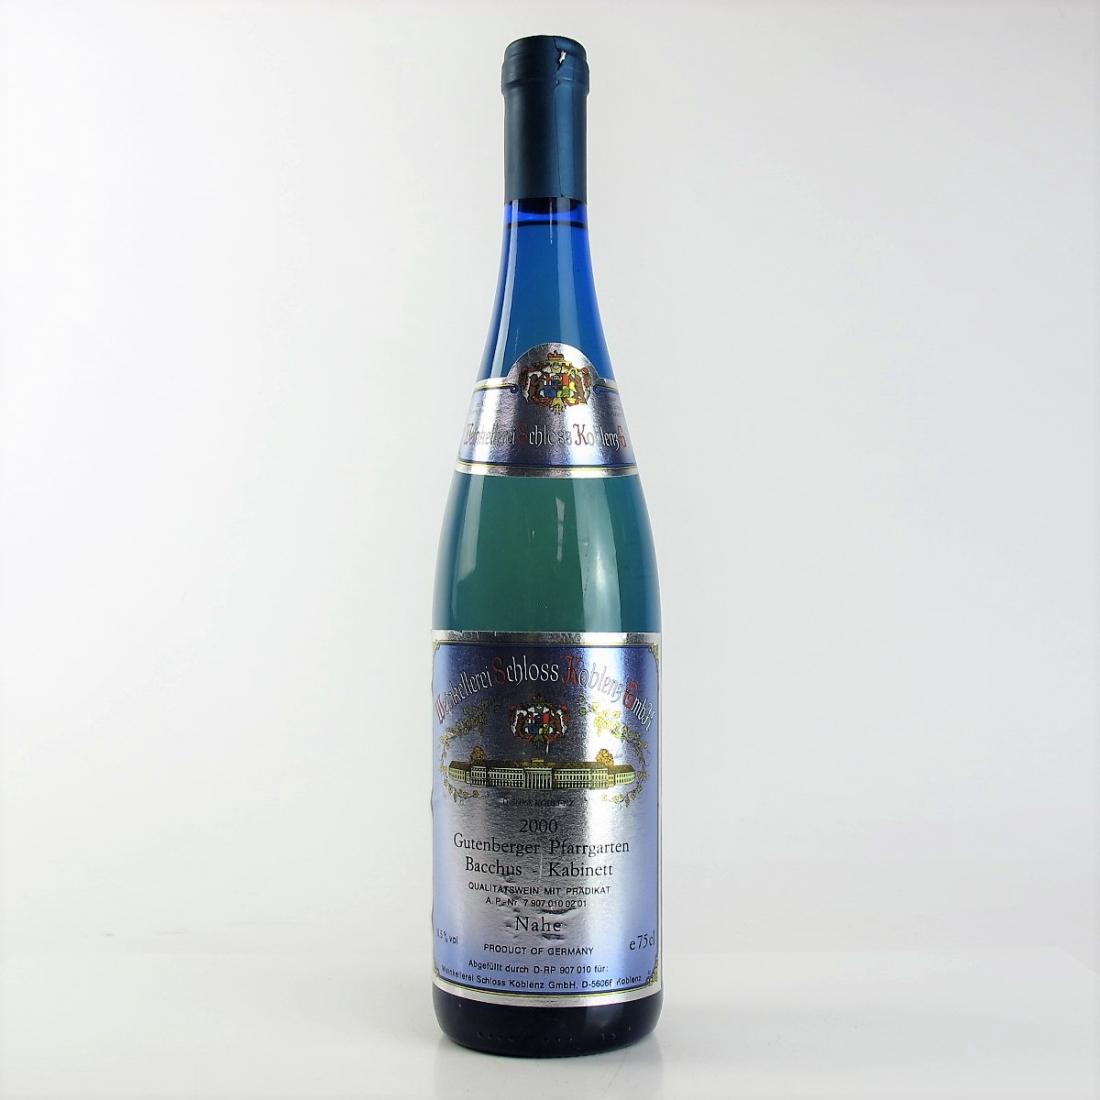 Koblenz Gutenberger Pfarrgarten Bacchus Kabinett Riesling 2000 Germany